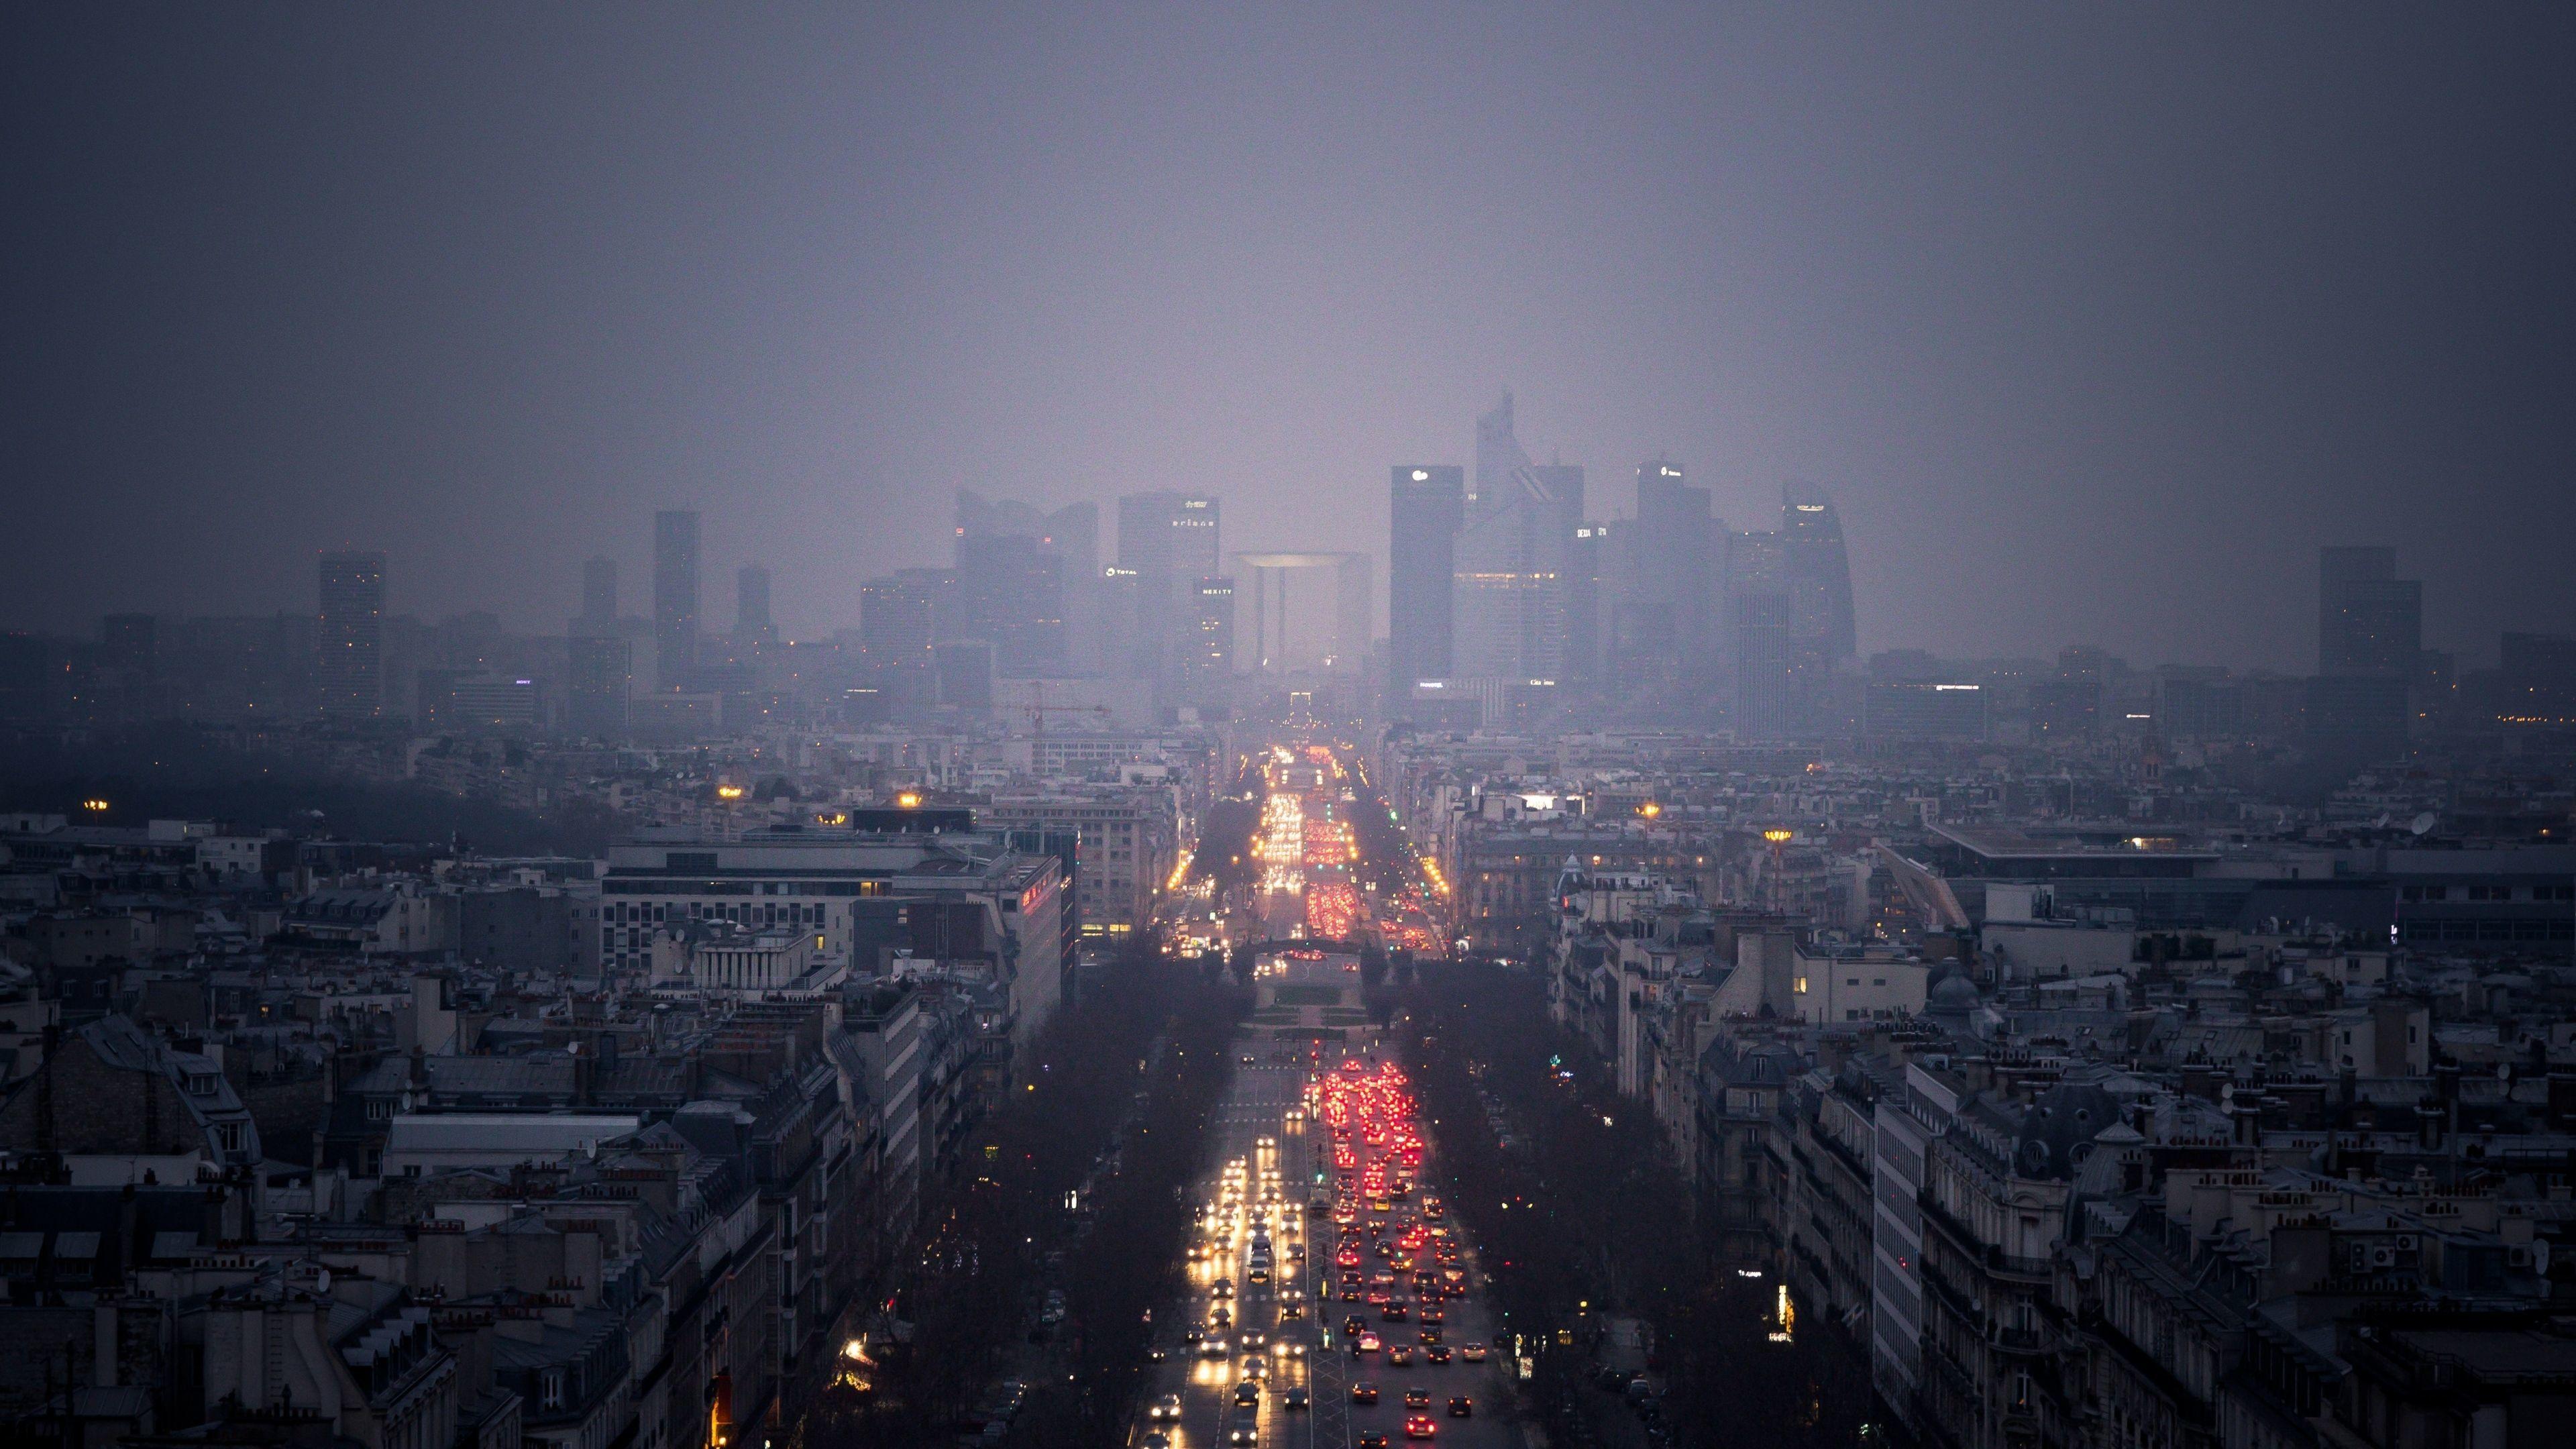 City Rain Wallpapers   Top City Rain Backgrounds 3840x2160